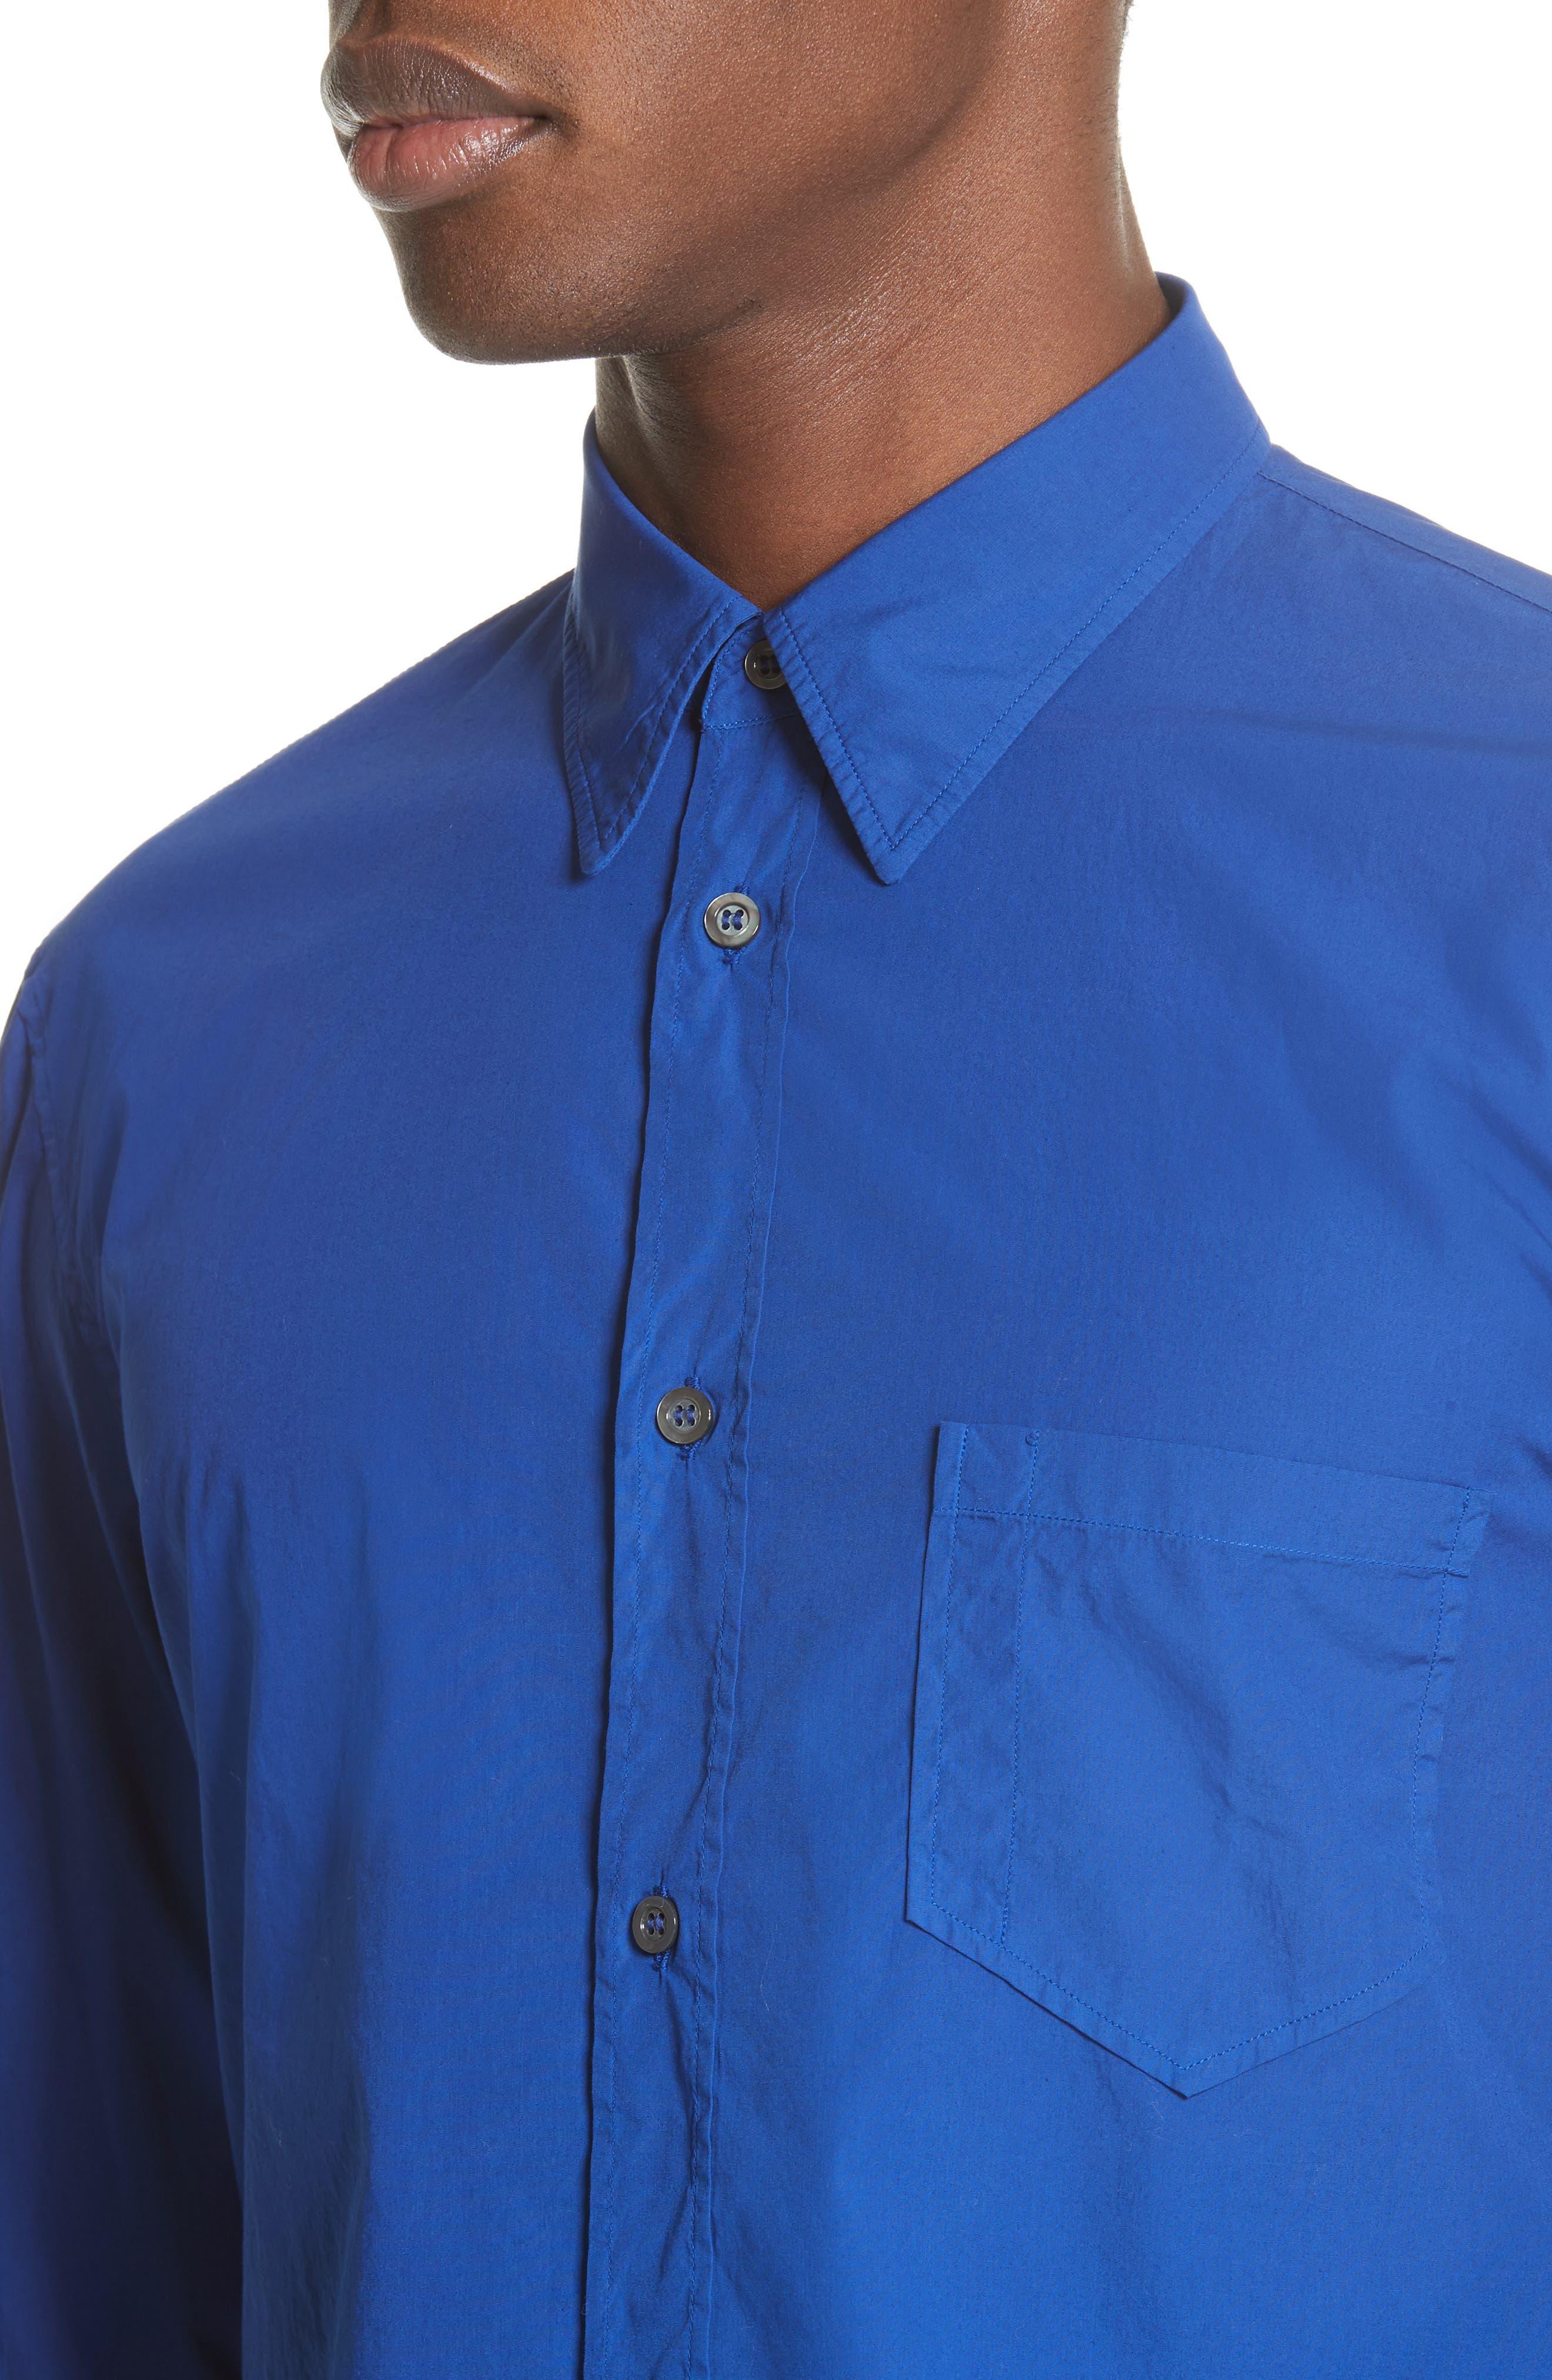 Poplin Shirt,                             Alternate thumbnail 4, color,                             400